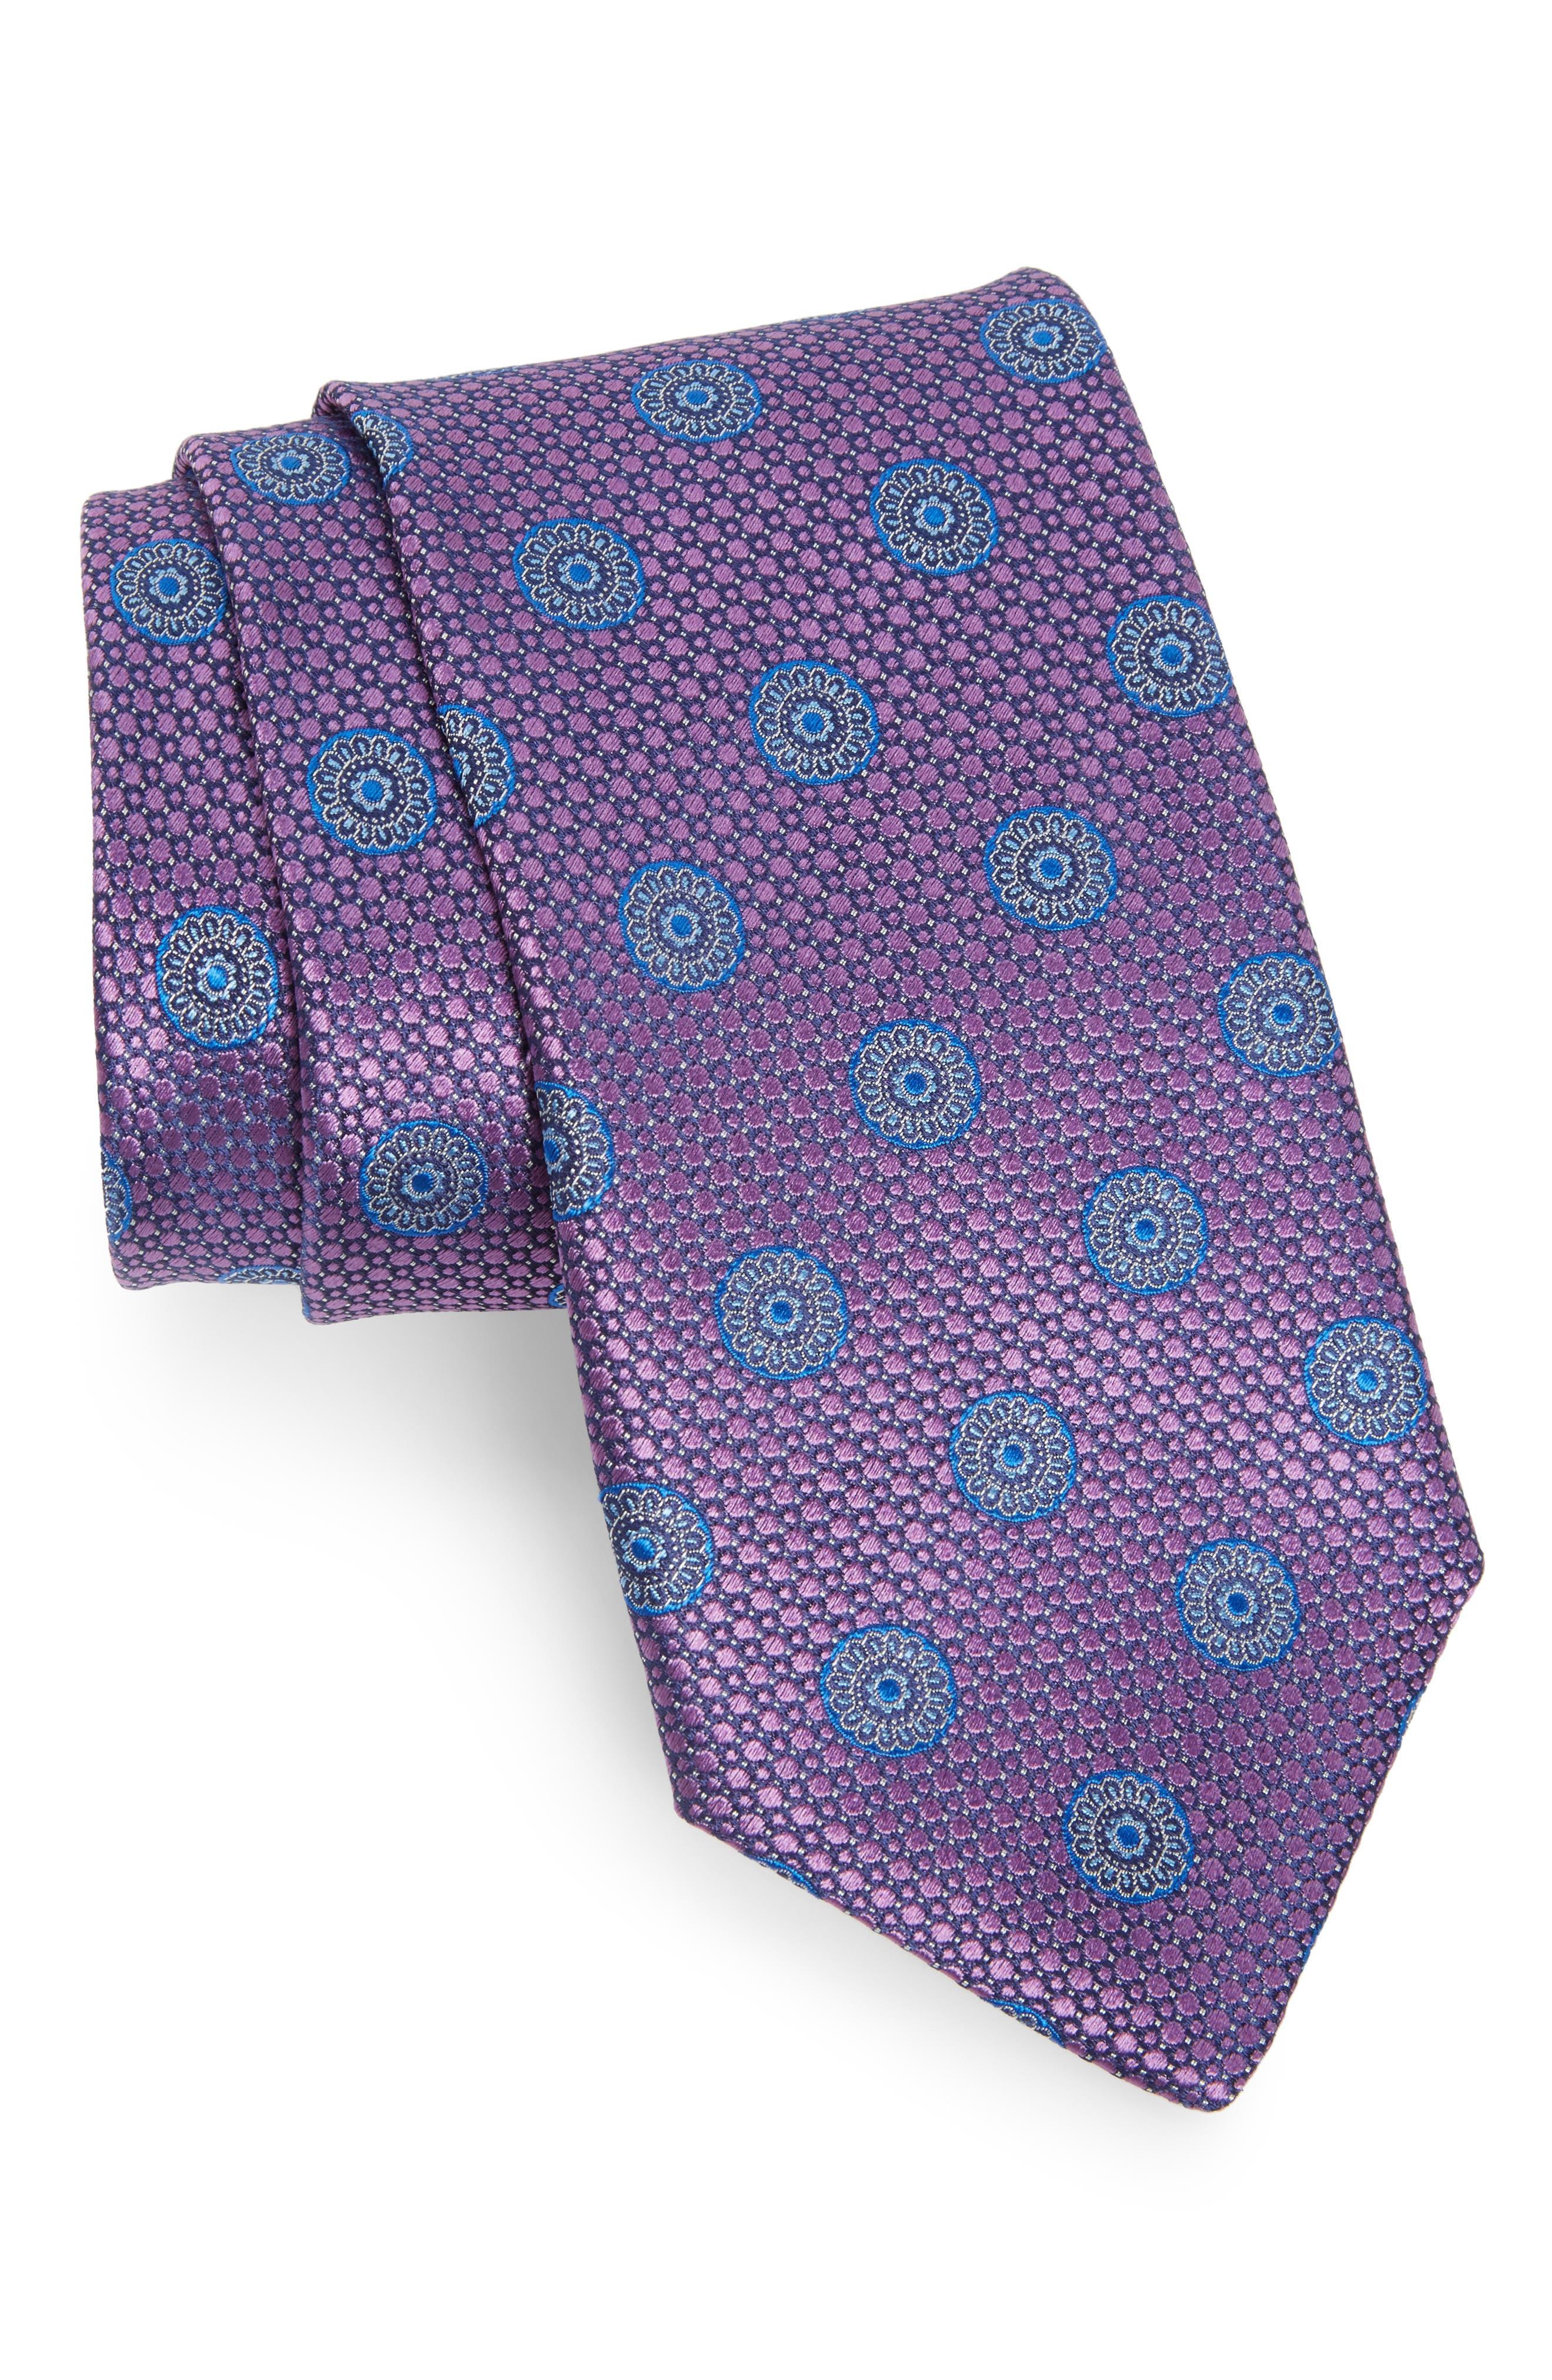 Medallion Silk Tie,                             Main thumbnail 1, color,                             500